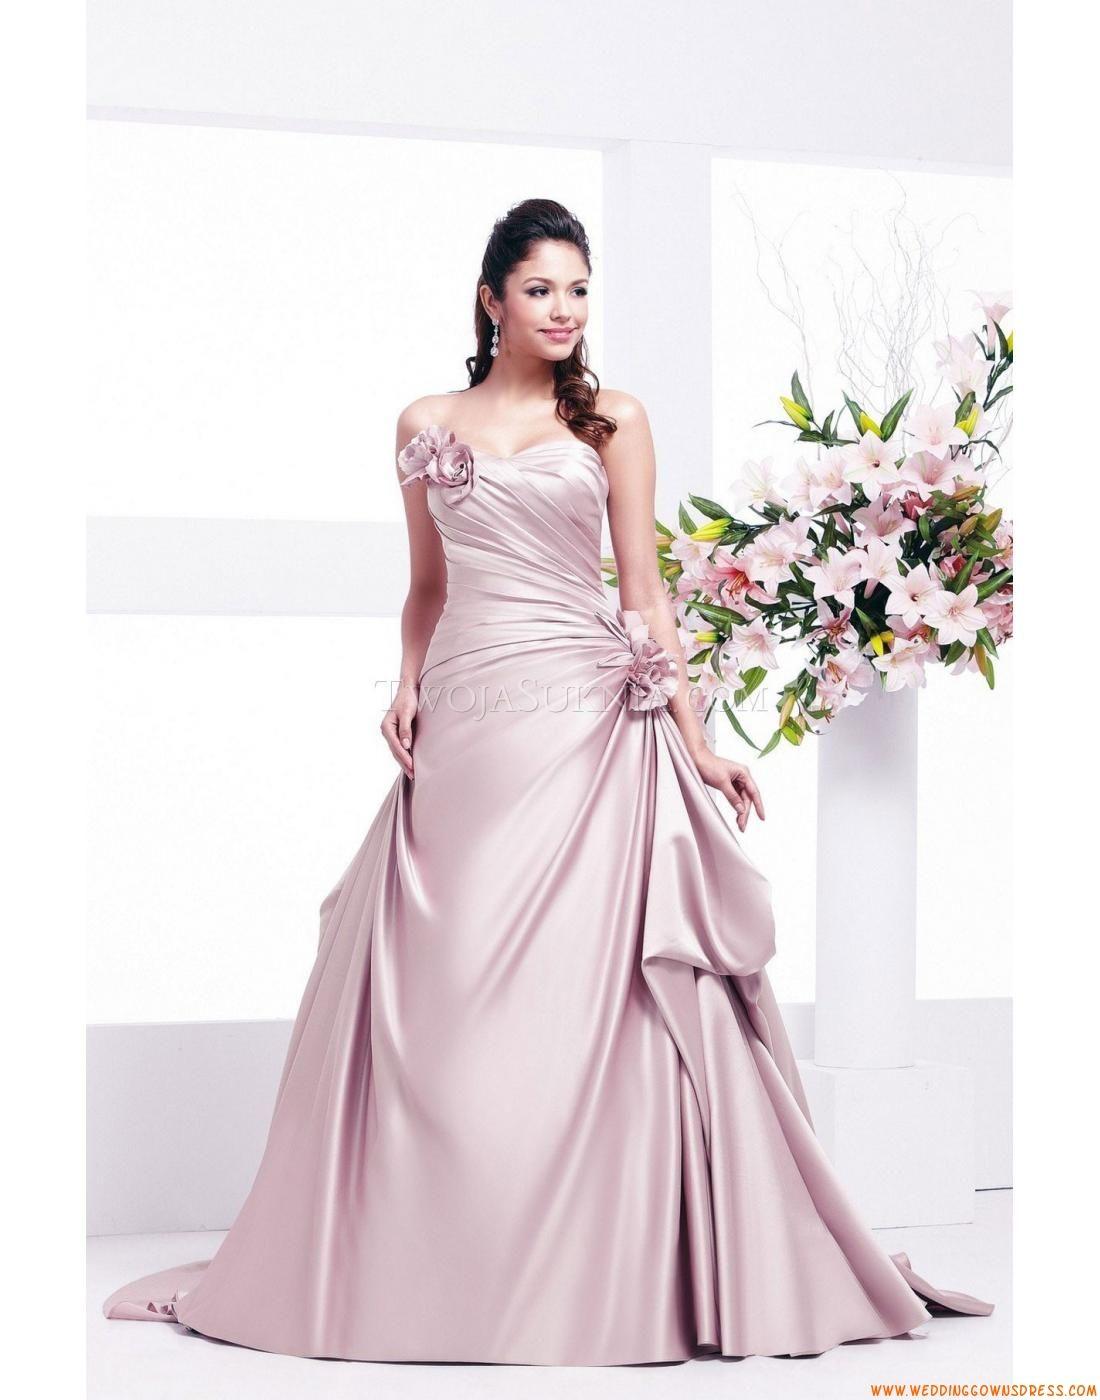 Wedding Dress Veromia VR 61102 Veromia | wedding dresses toronto ...